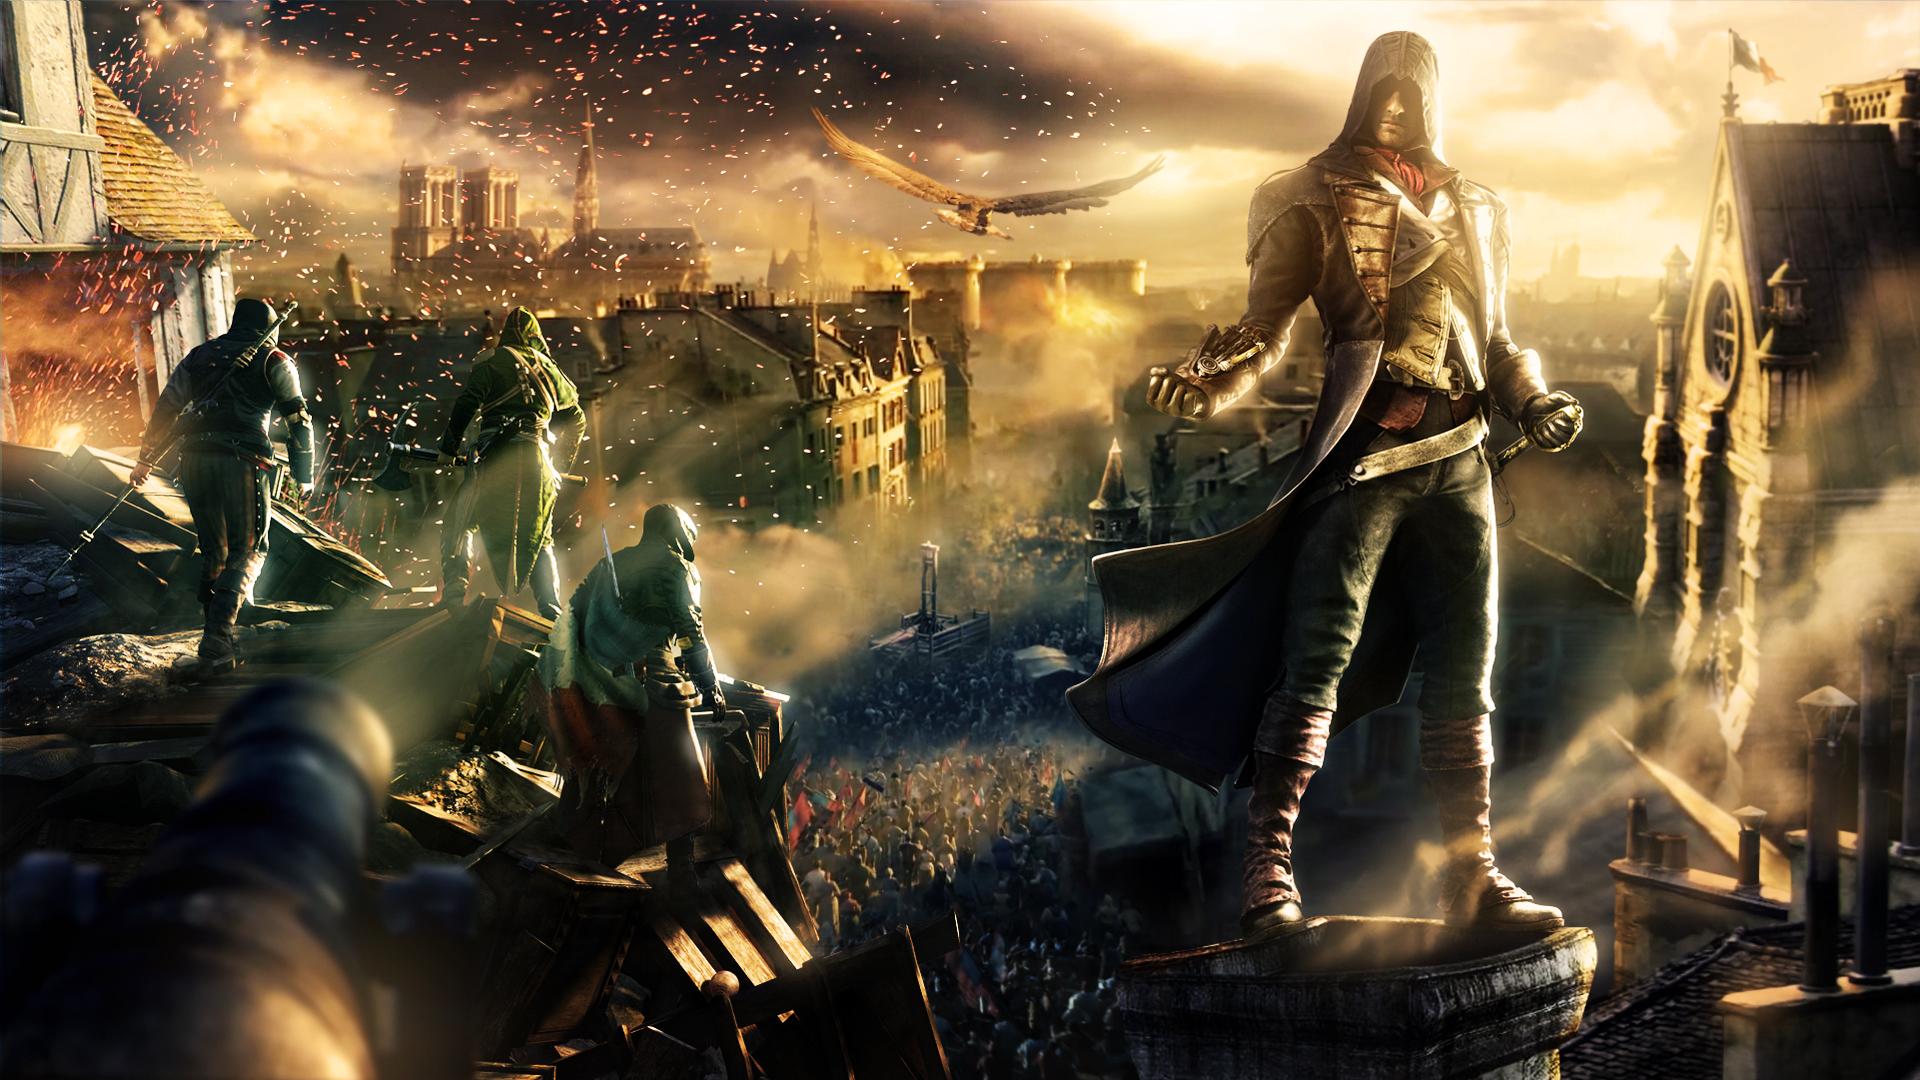 Assassin-s-Creed-Unity-1920x1080-wallpaper-wp3602759